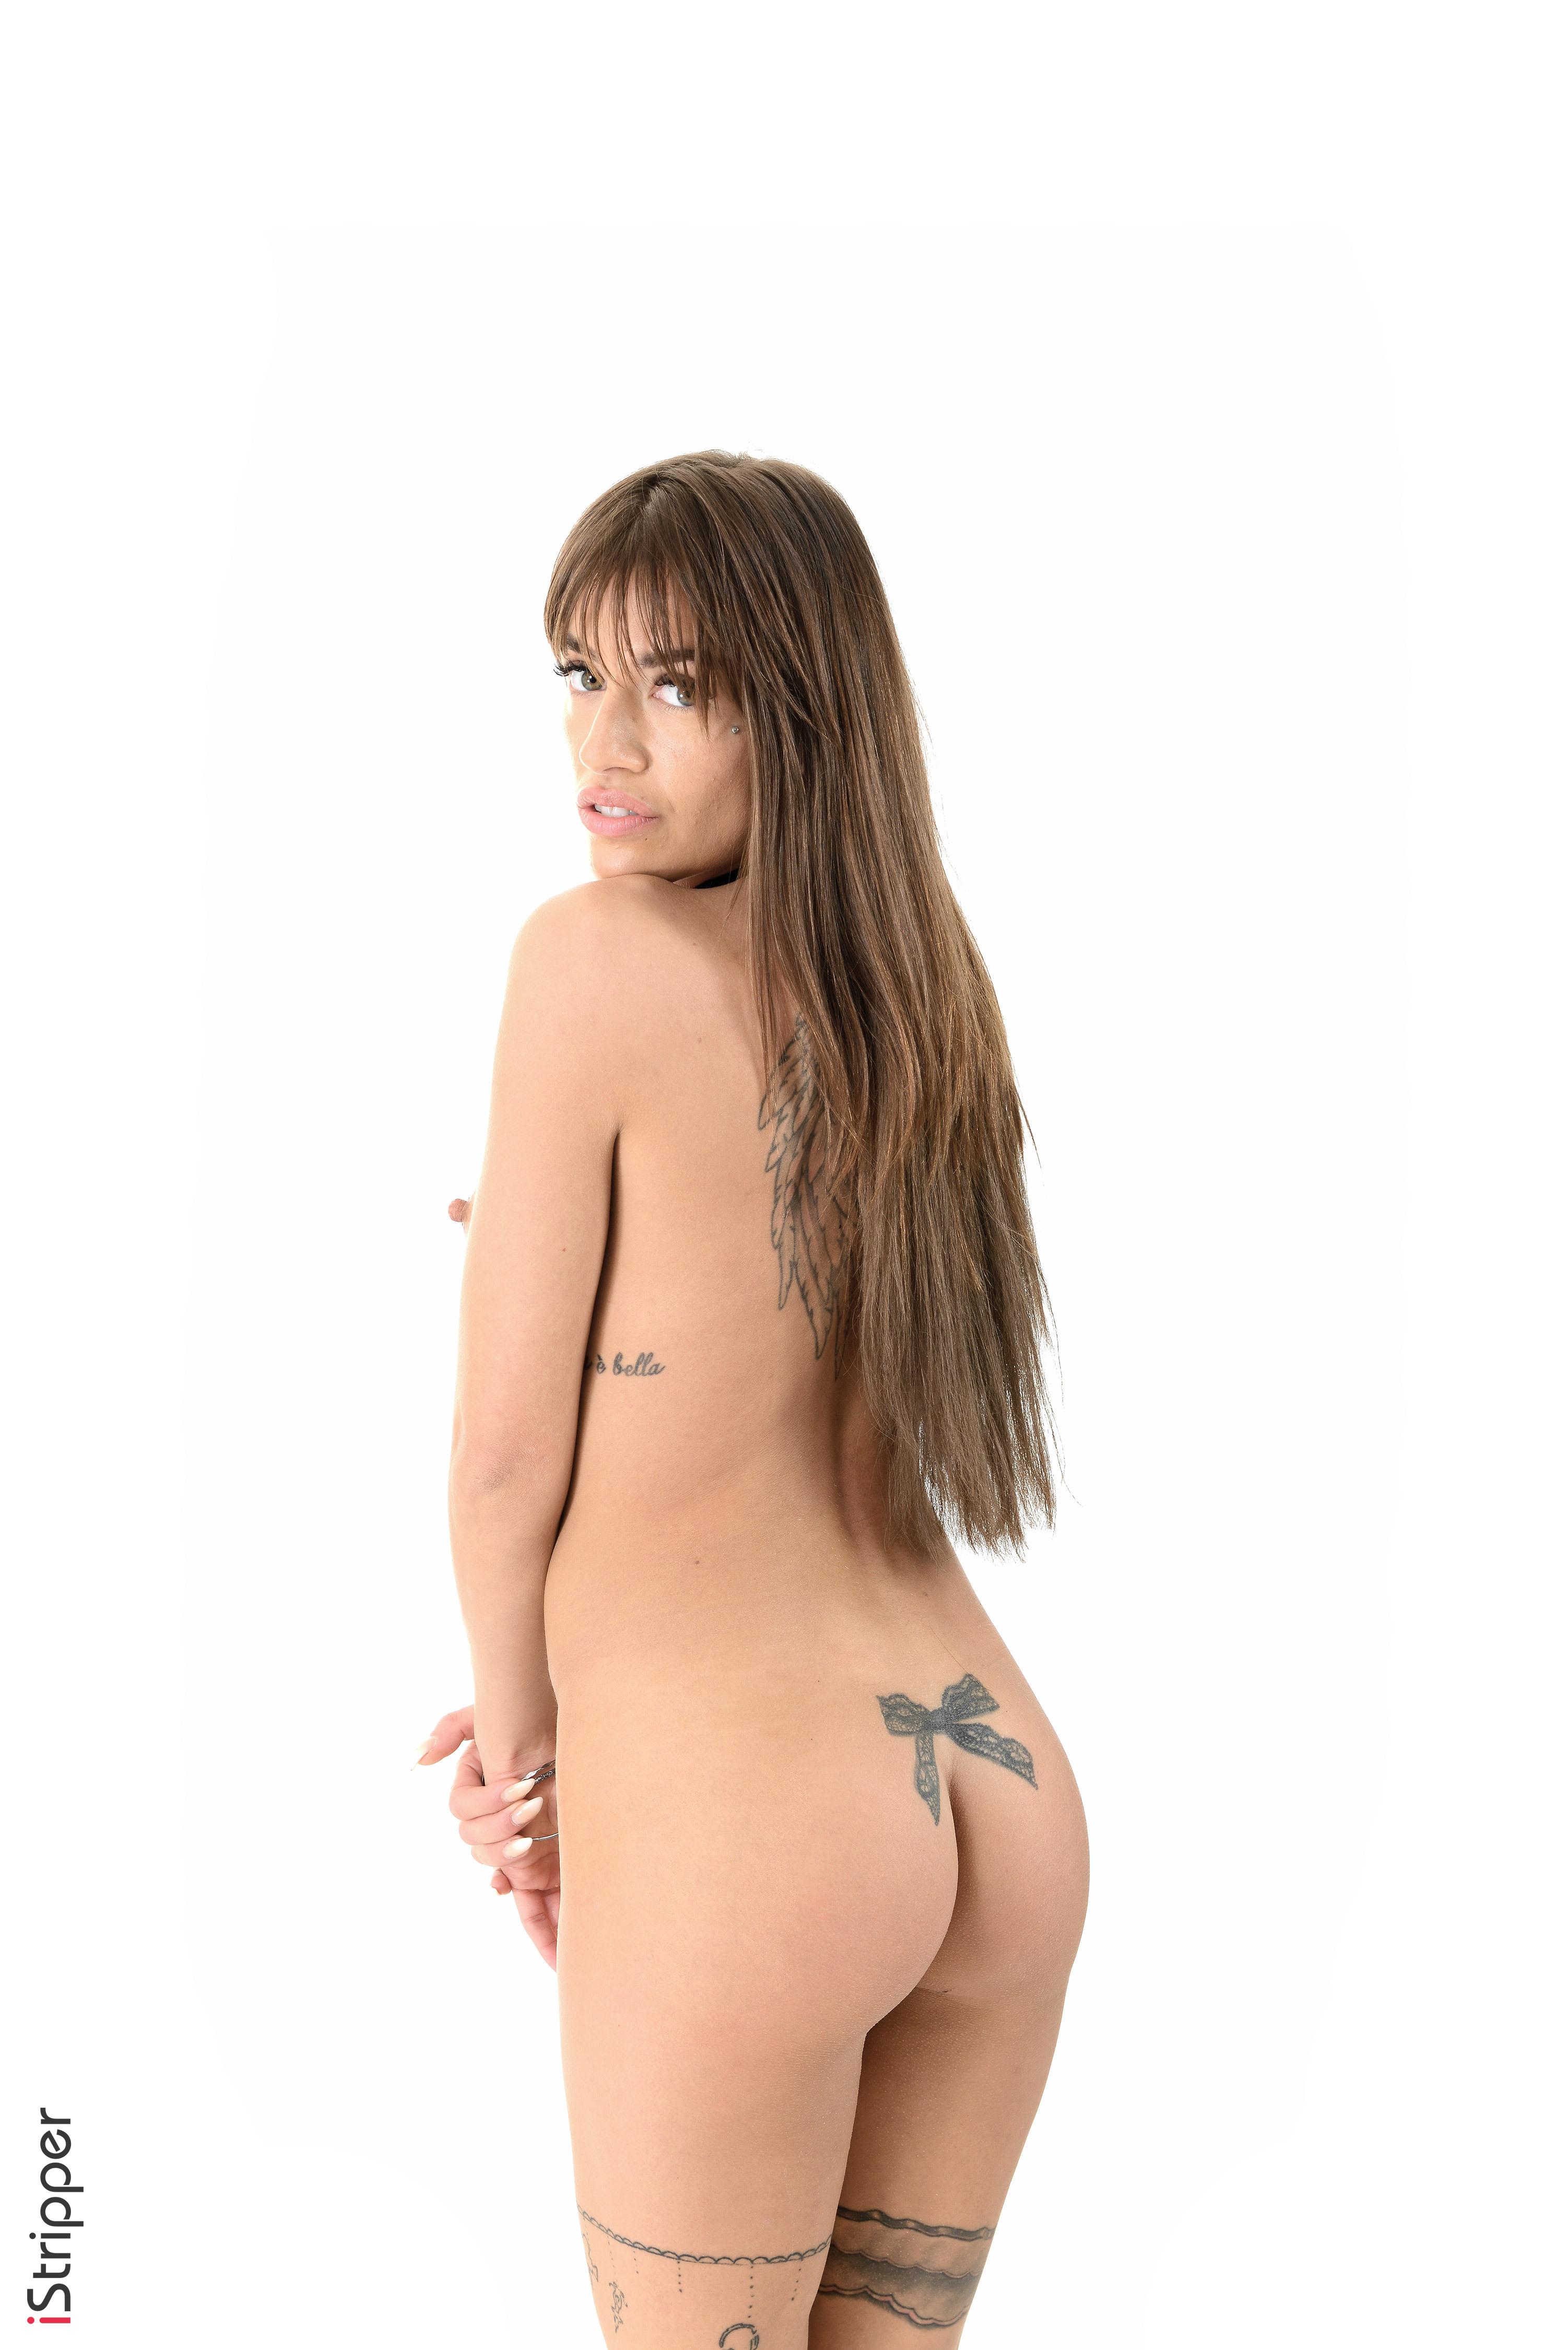 sexy hot girl wallpaper hd